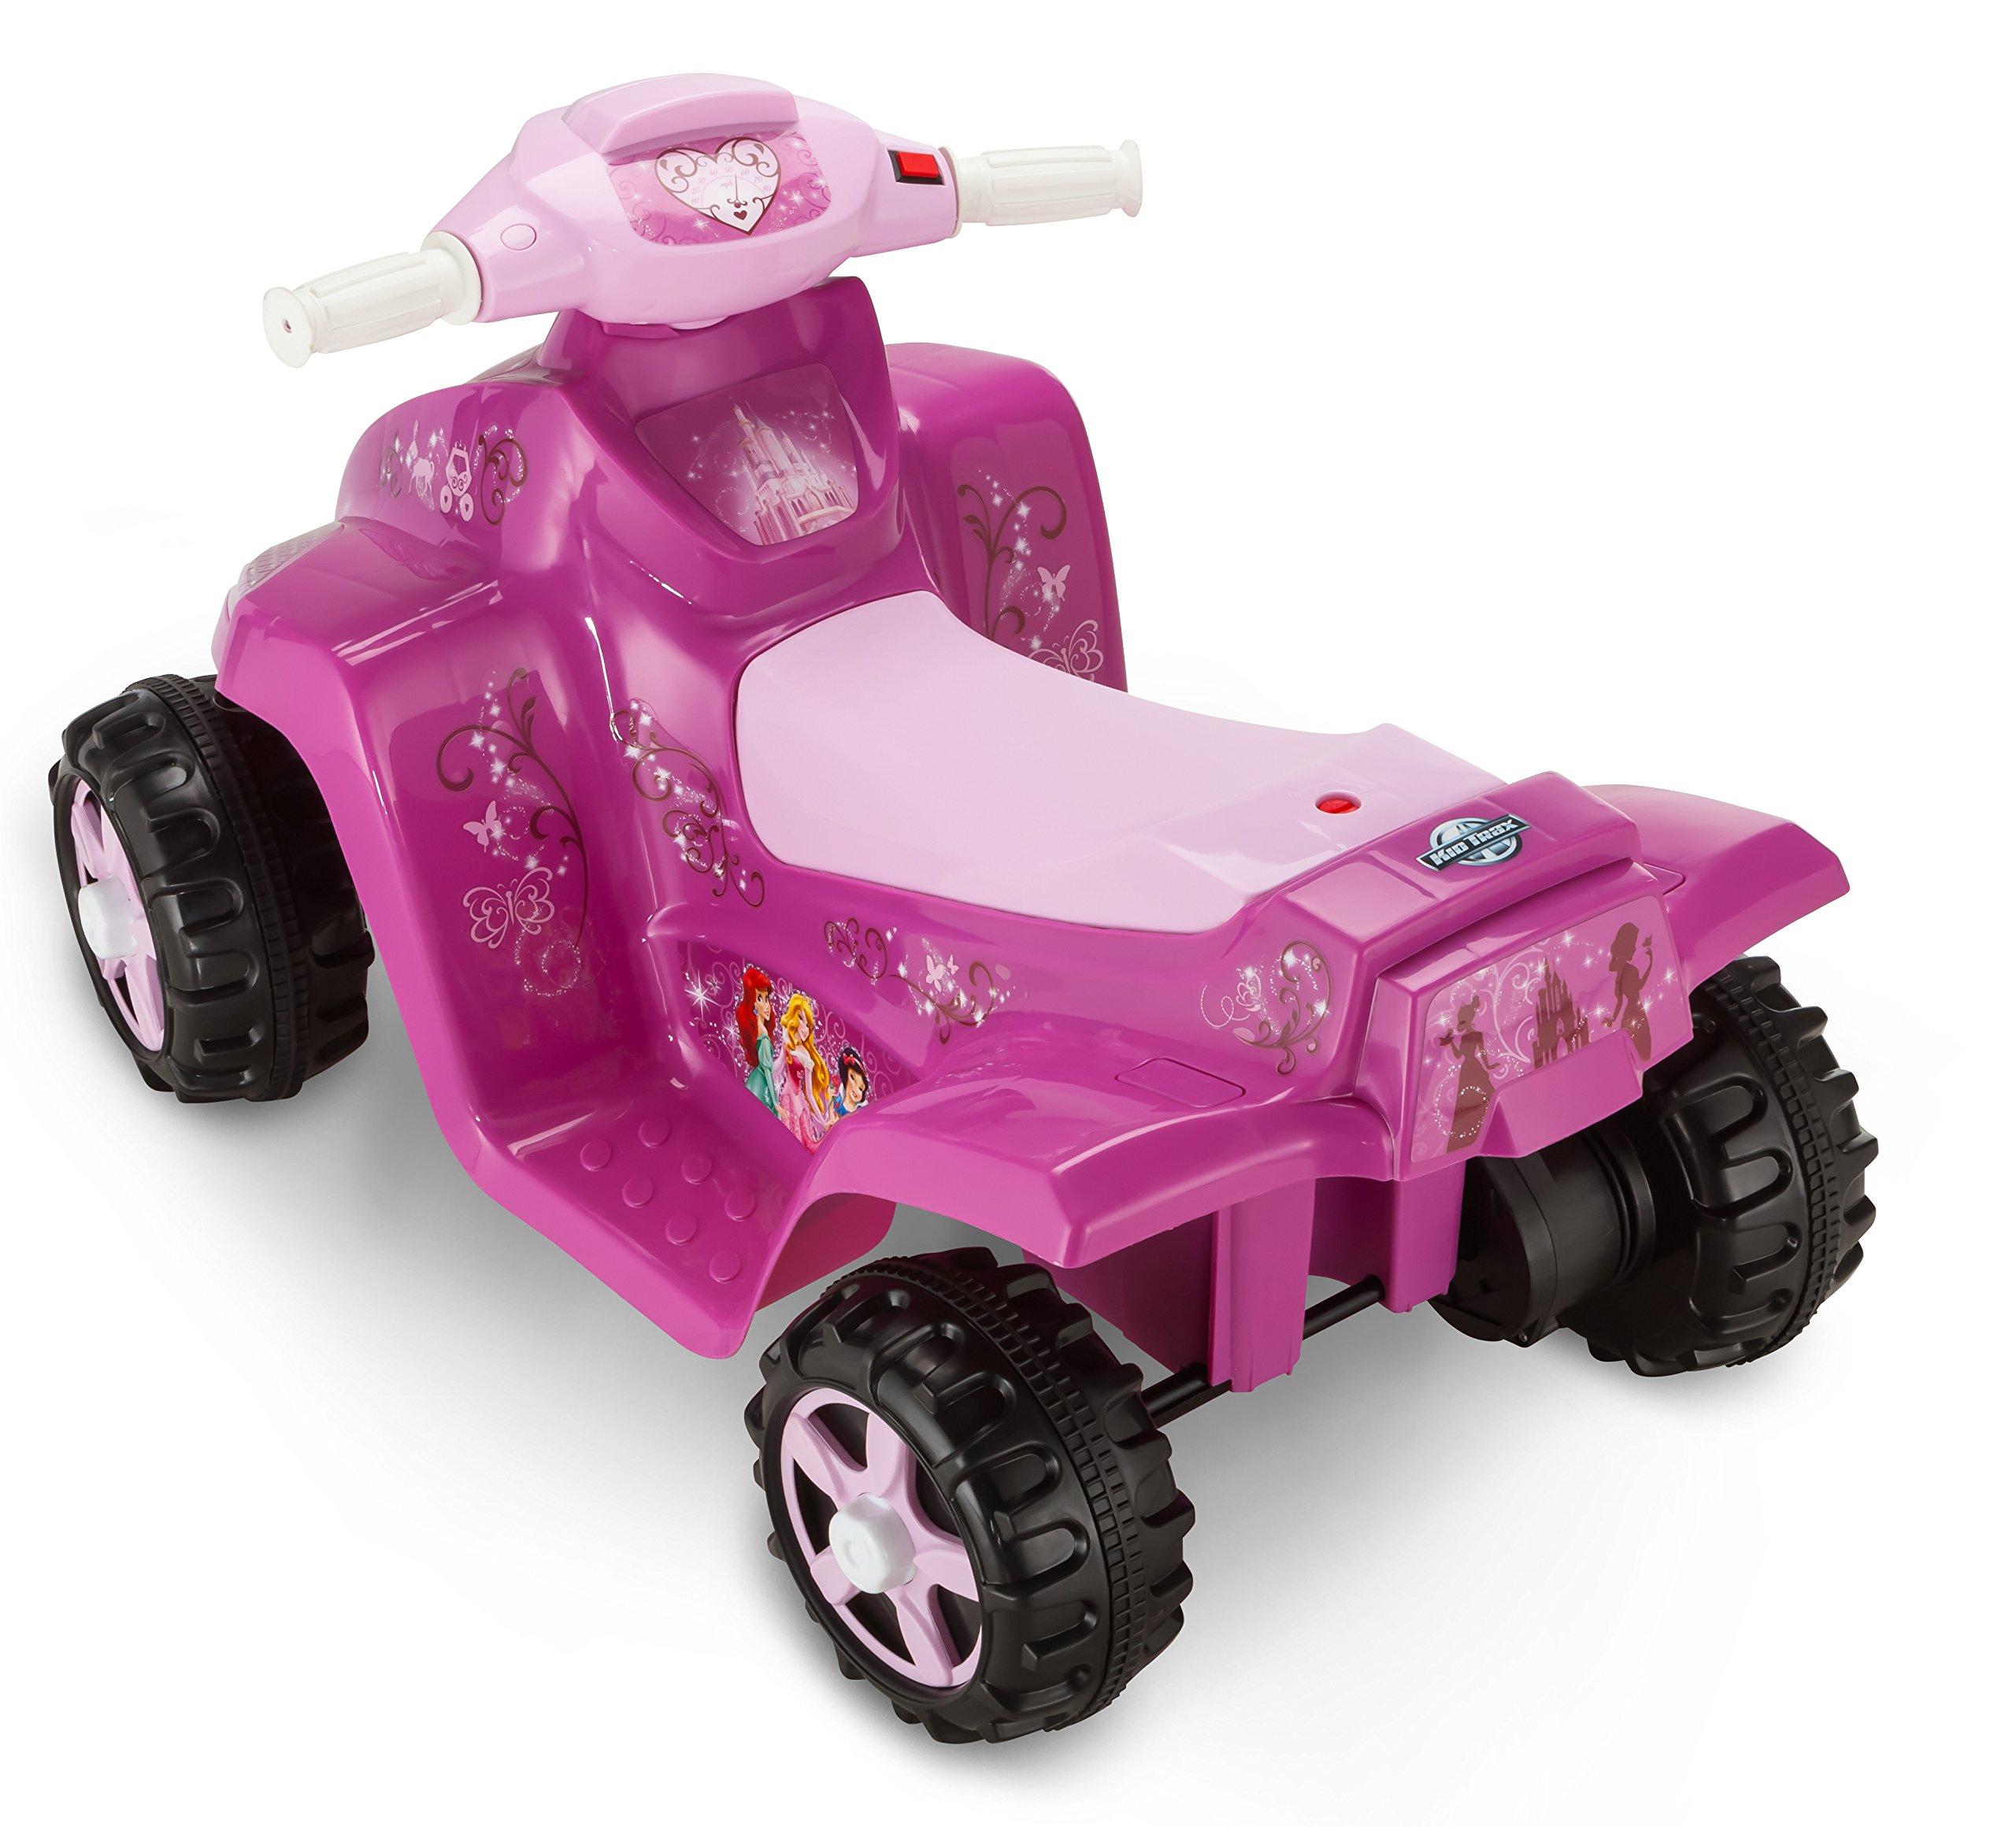 Kid Trax Disney Princess 6V Toddler Quad Ride On, Pink by Kid Trax (Image #2)